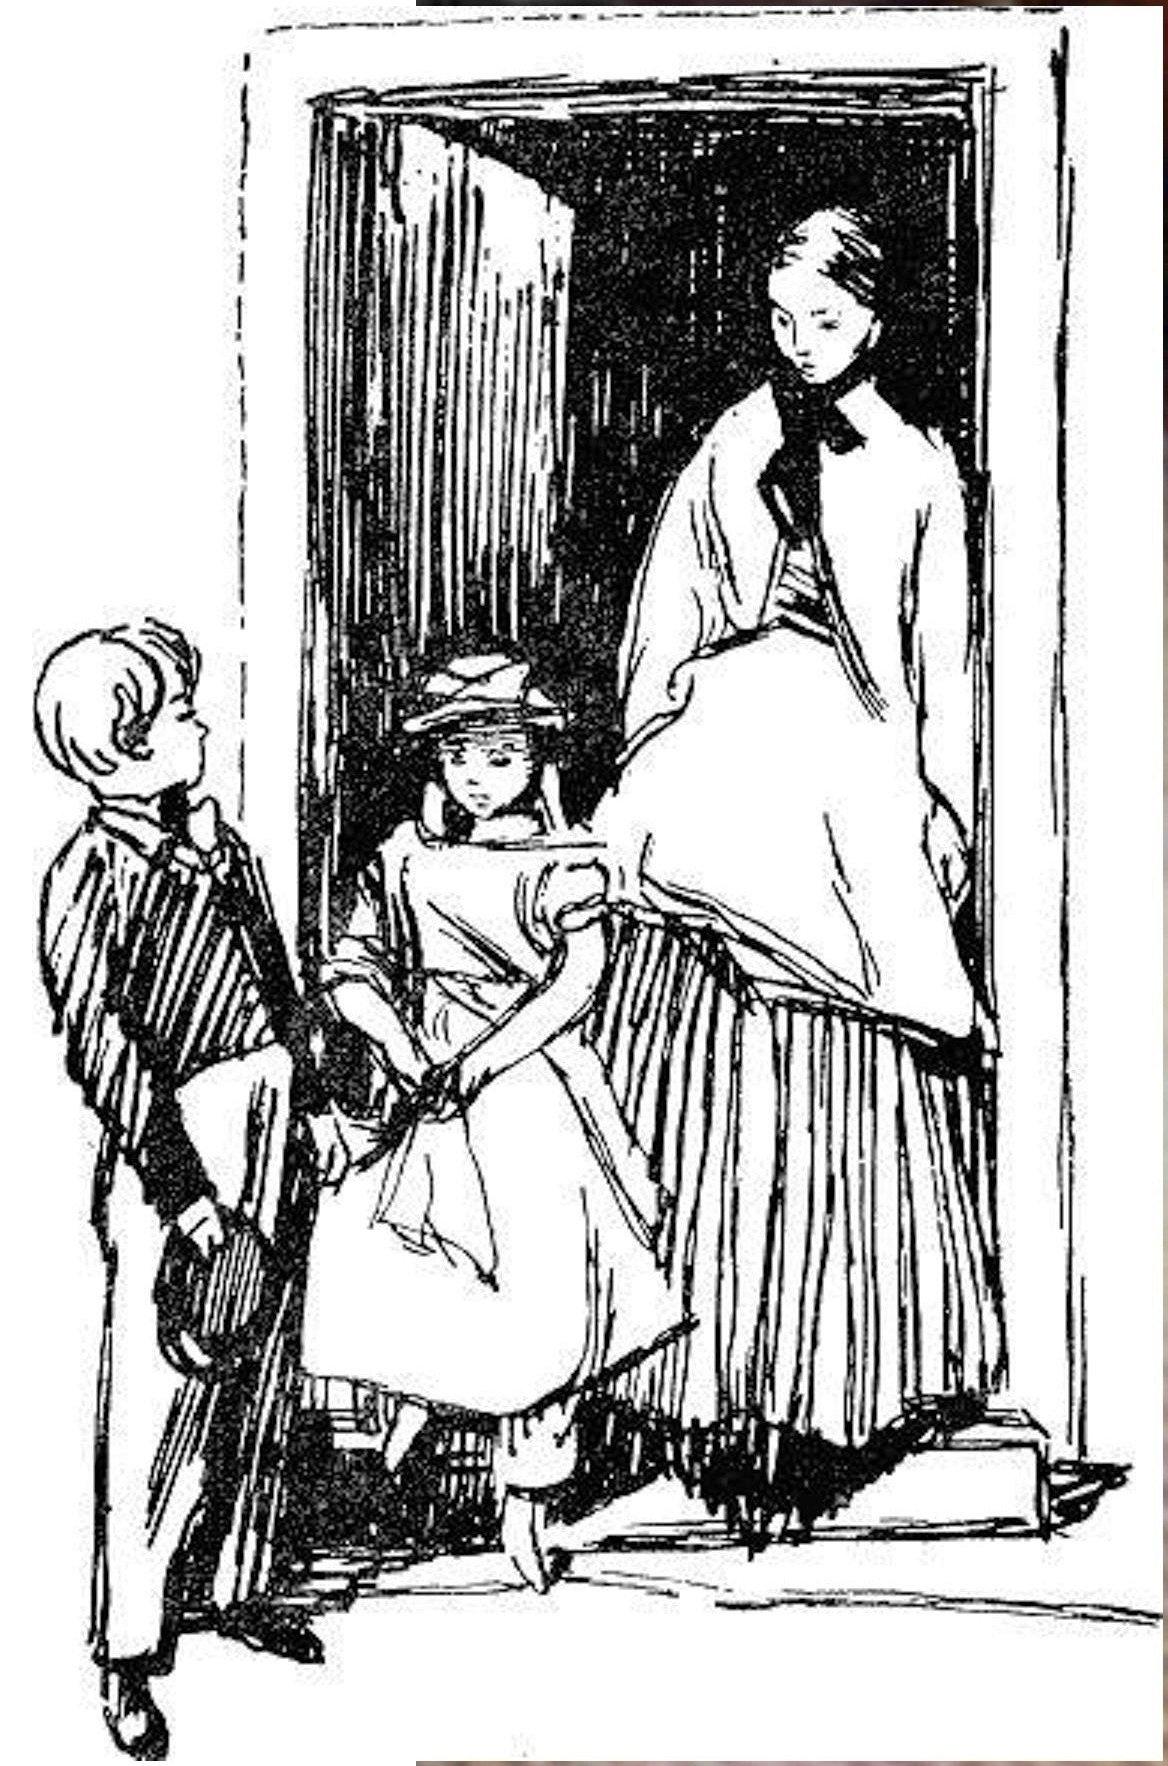 Иллюстрация В. Н. Горяева к пр-ю М.Твена Приключения Тома Сойера (35).